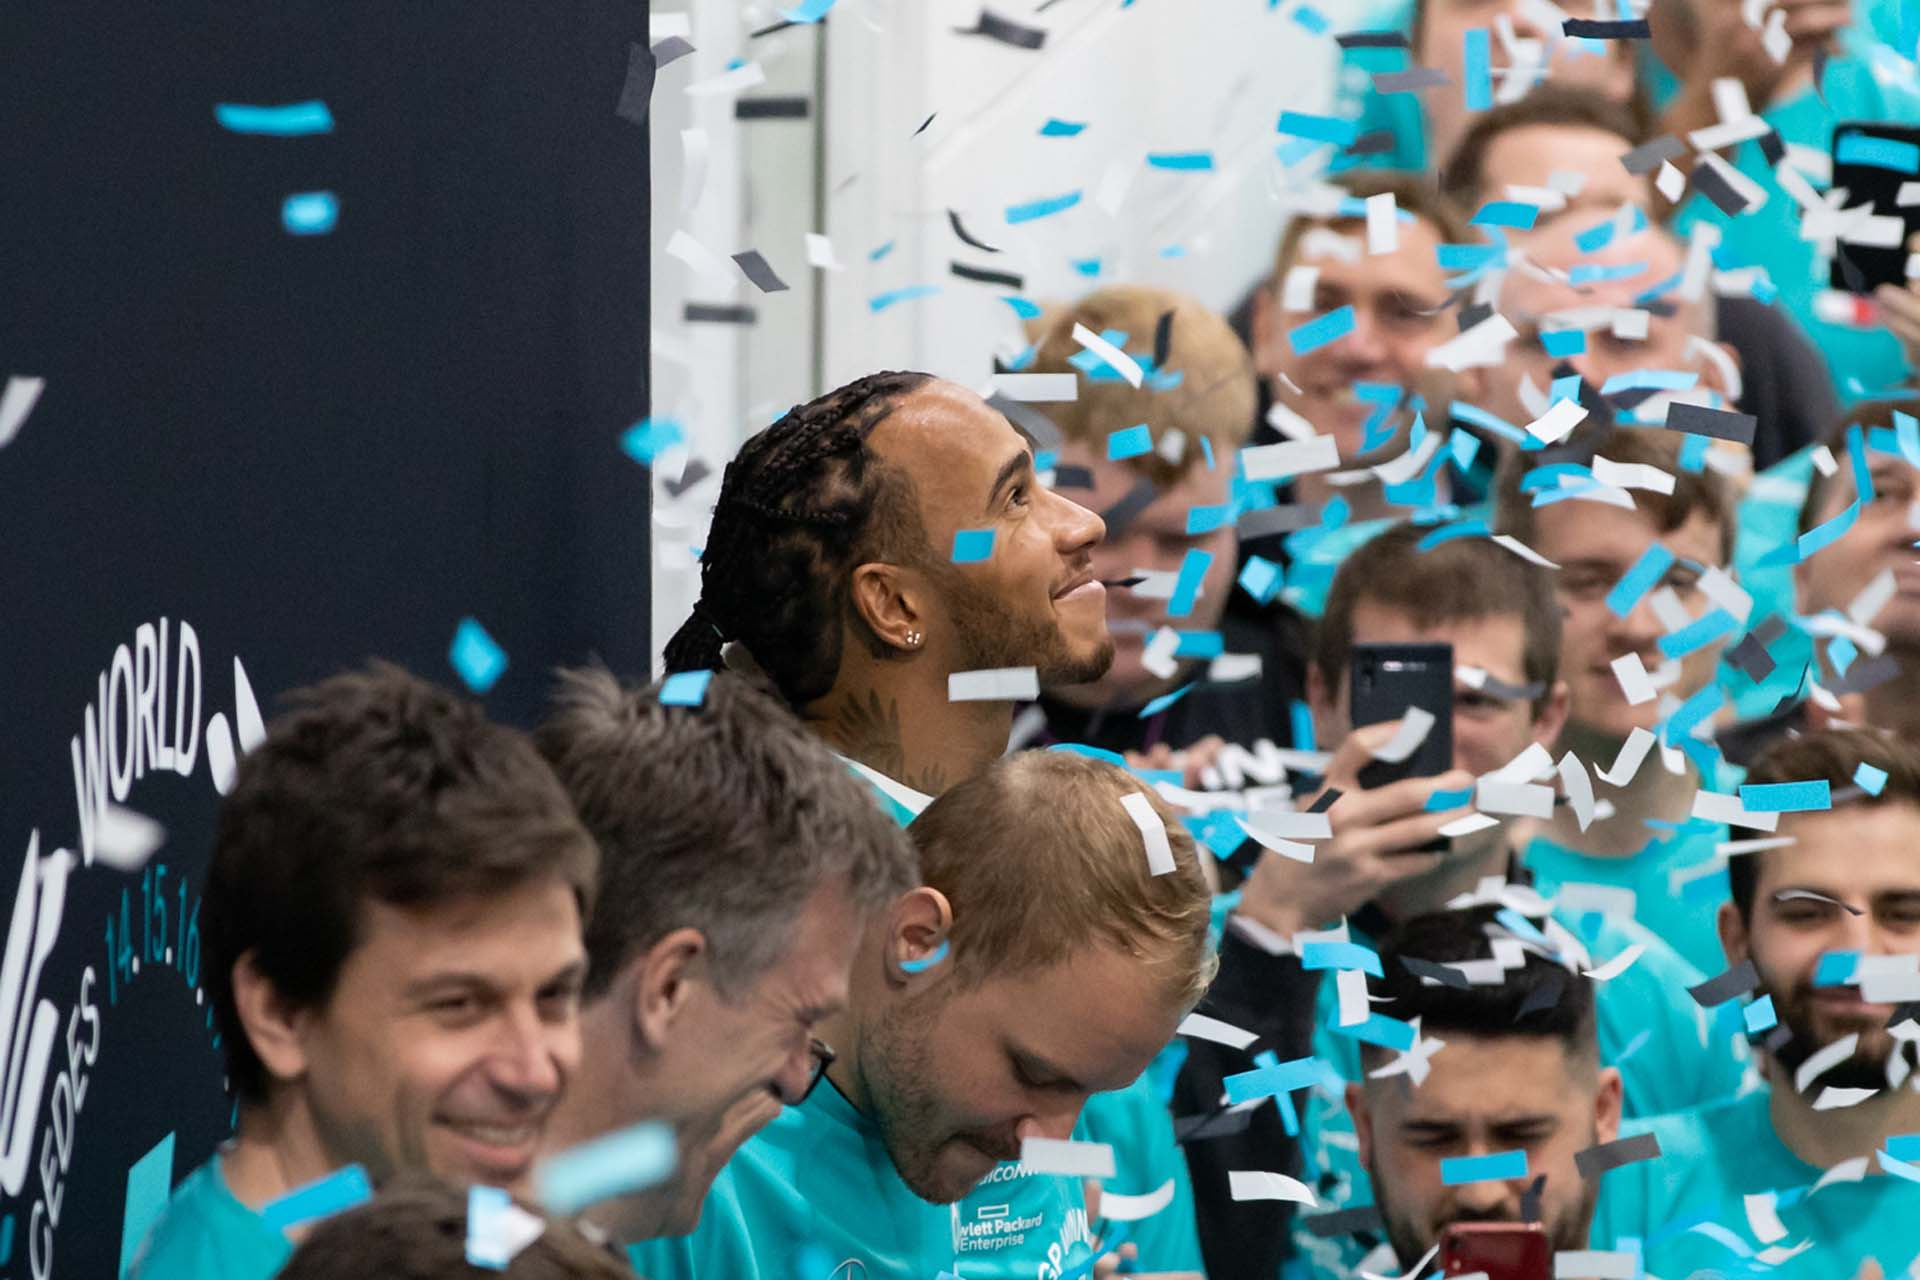 2019 Championship Celebrations - Brackley and Brixworth